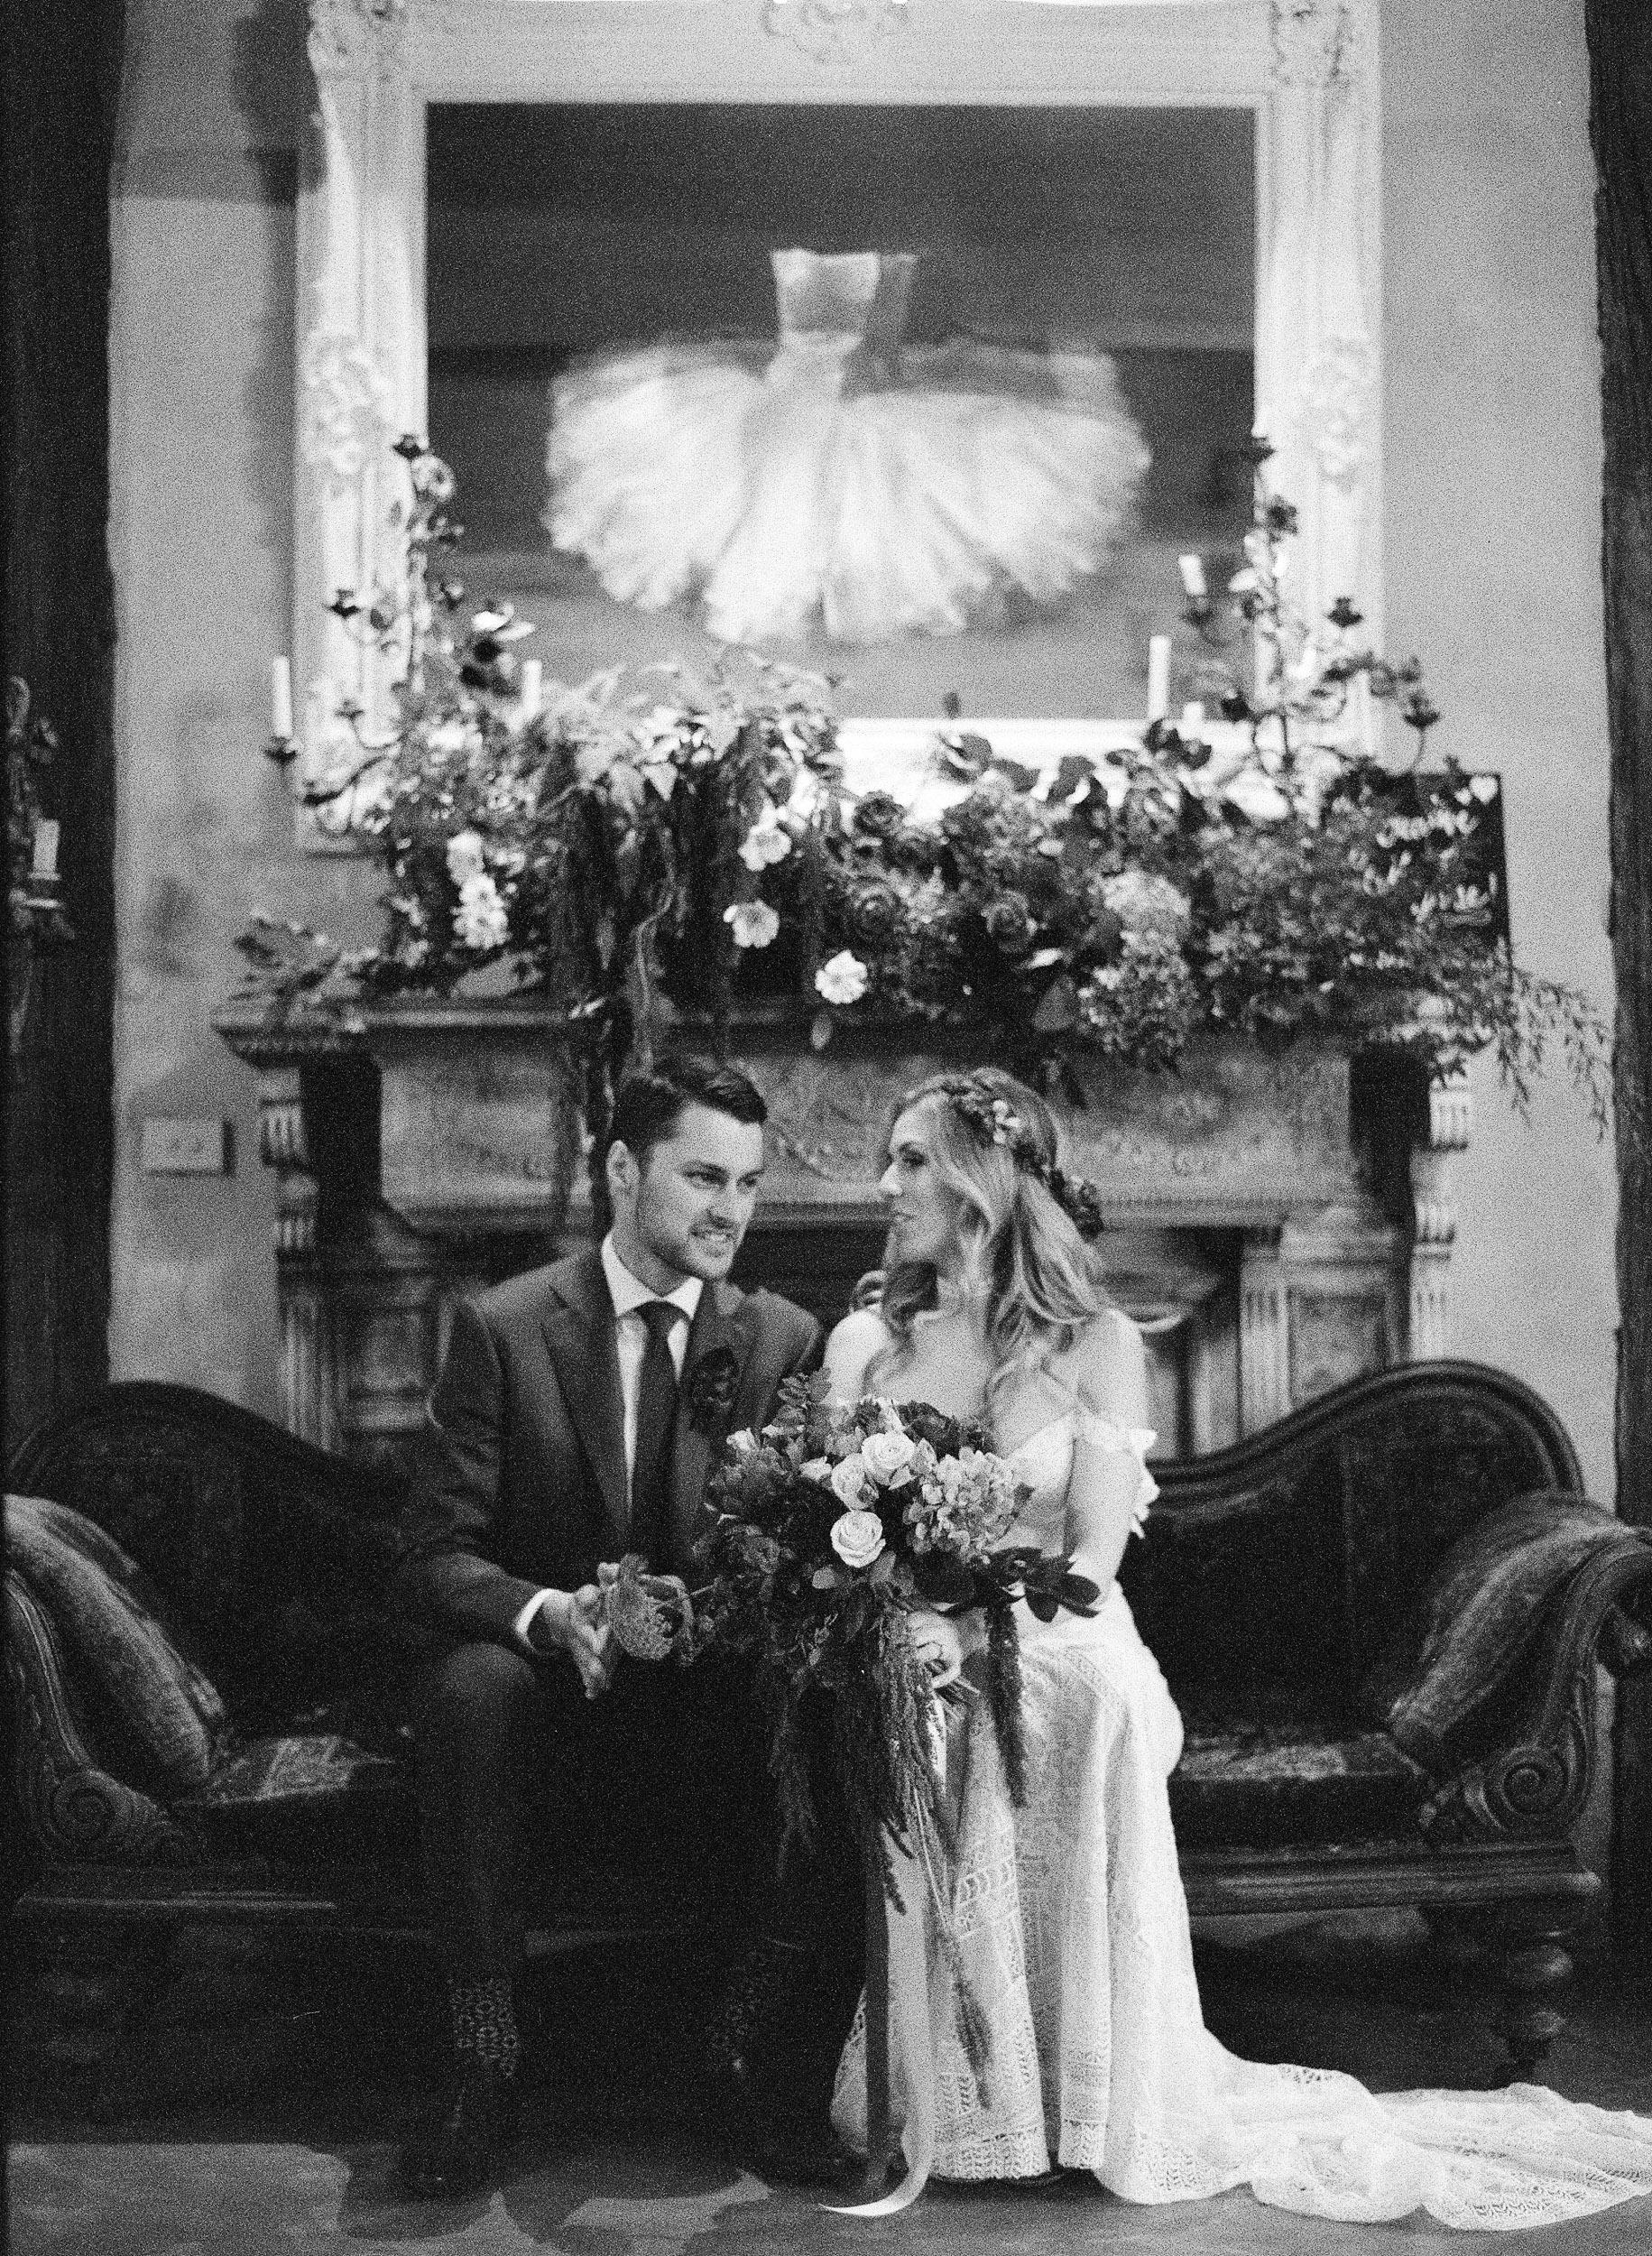 wedding (1 of 24) - 000003140001.jpg